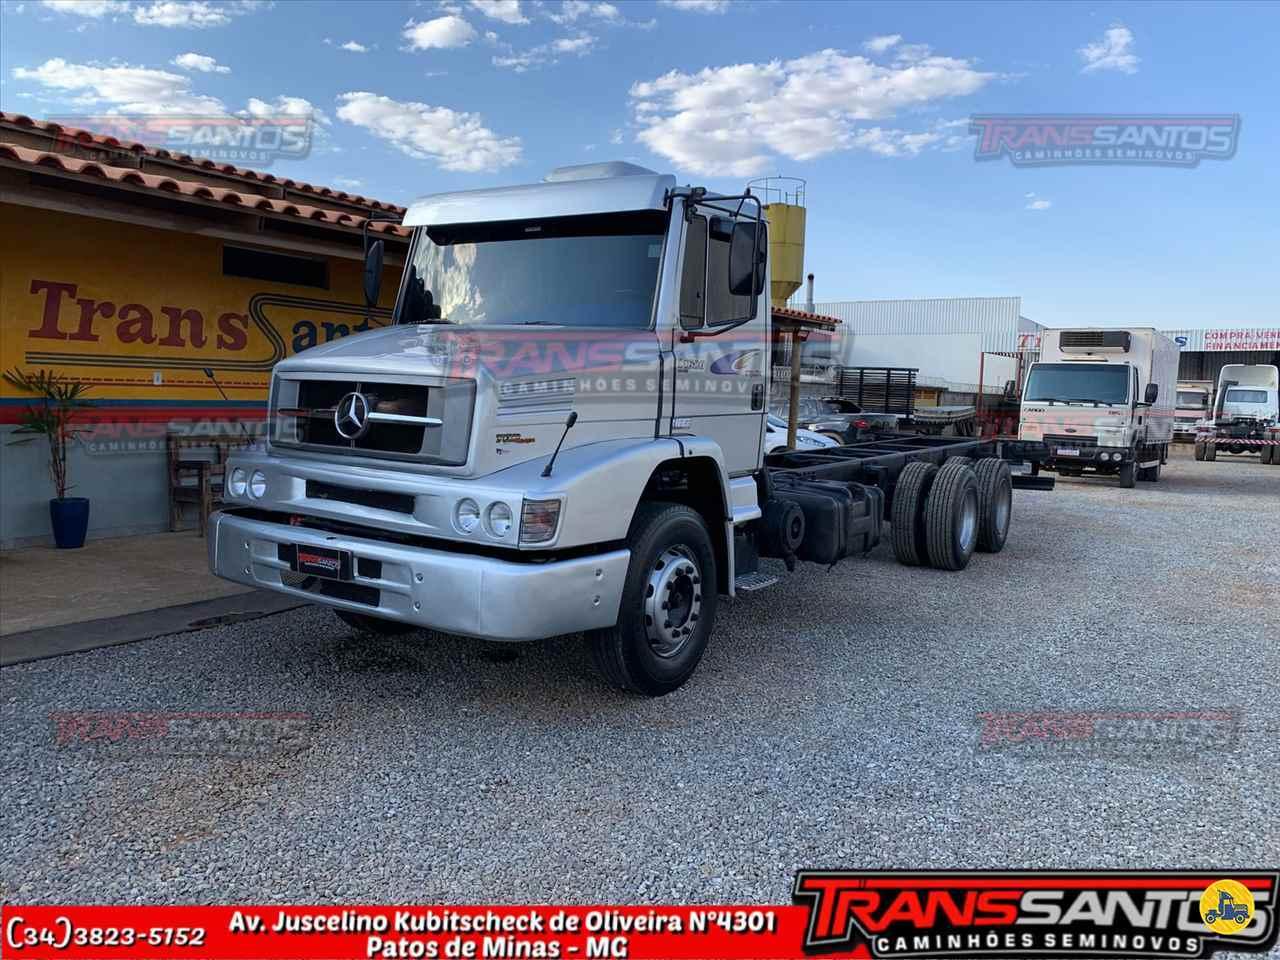 MB 1620 de TransSantos Seminovos - PATOS DE MINAS/MG